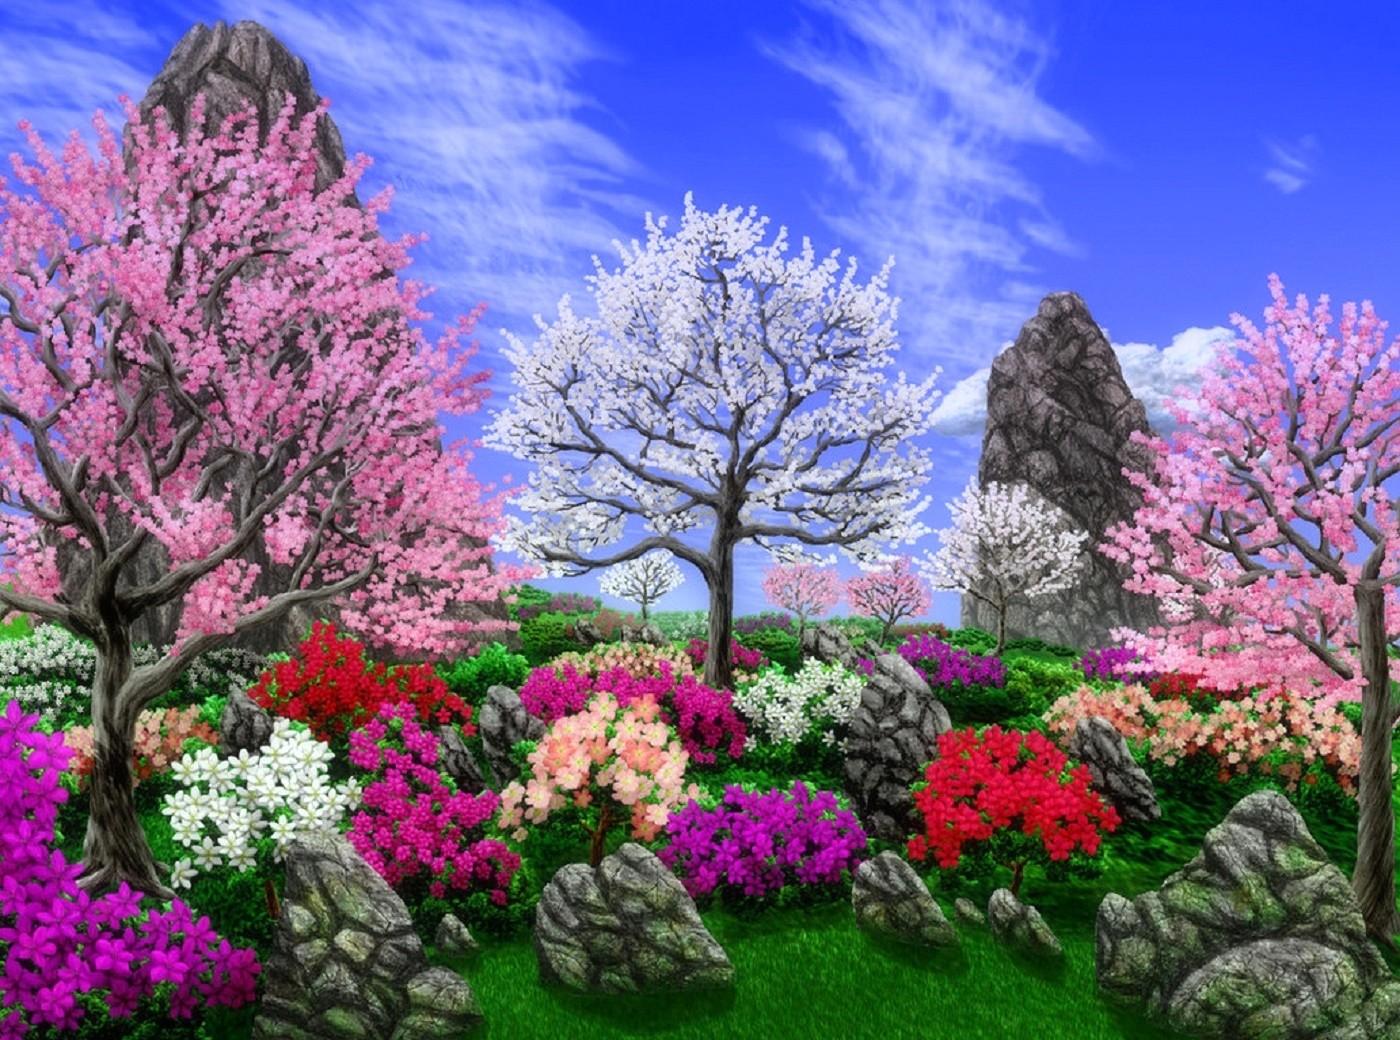 Drawn scenery spring scenery Flowers: 1400x1040 Garden Paintings Spring